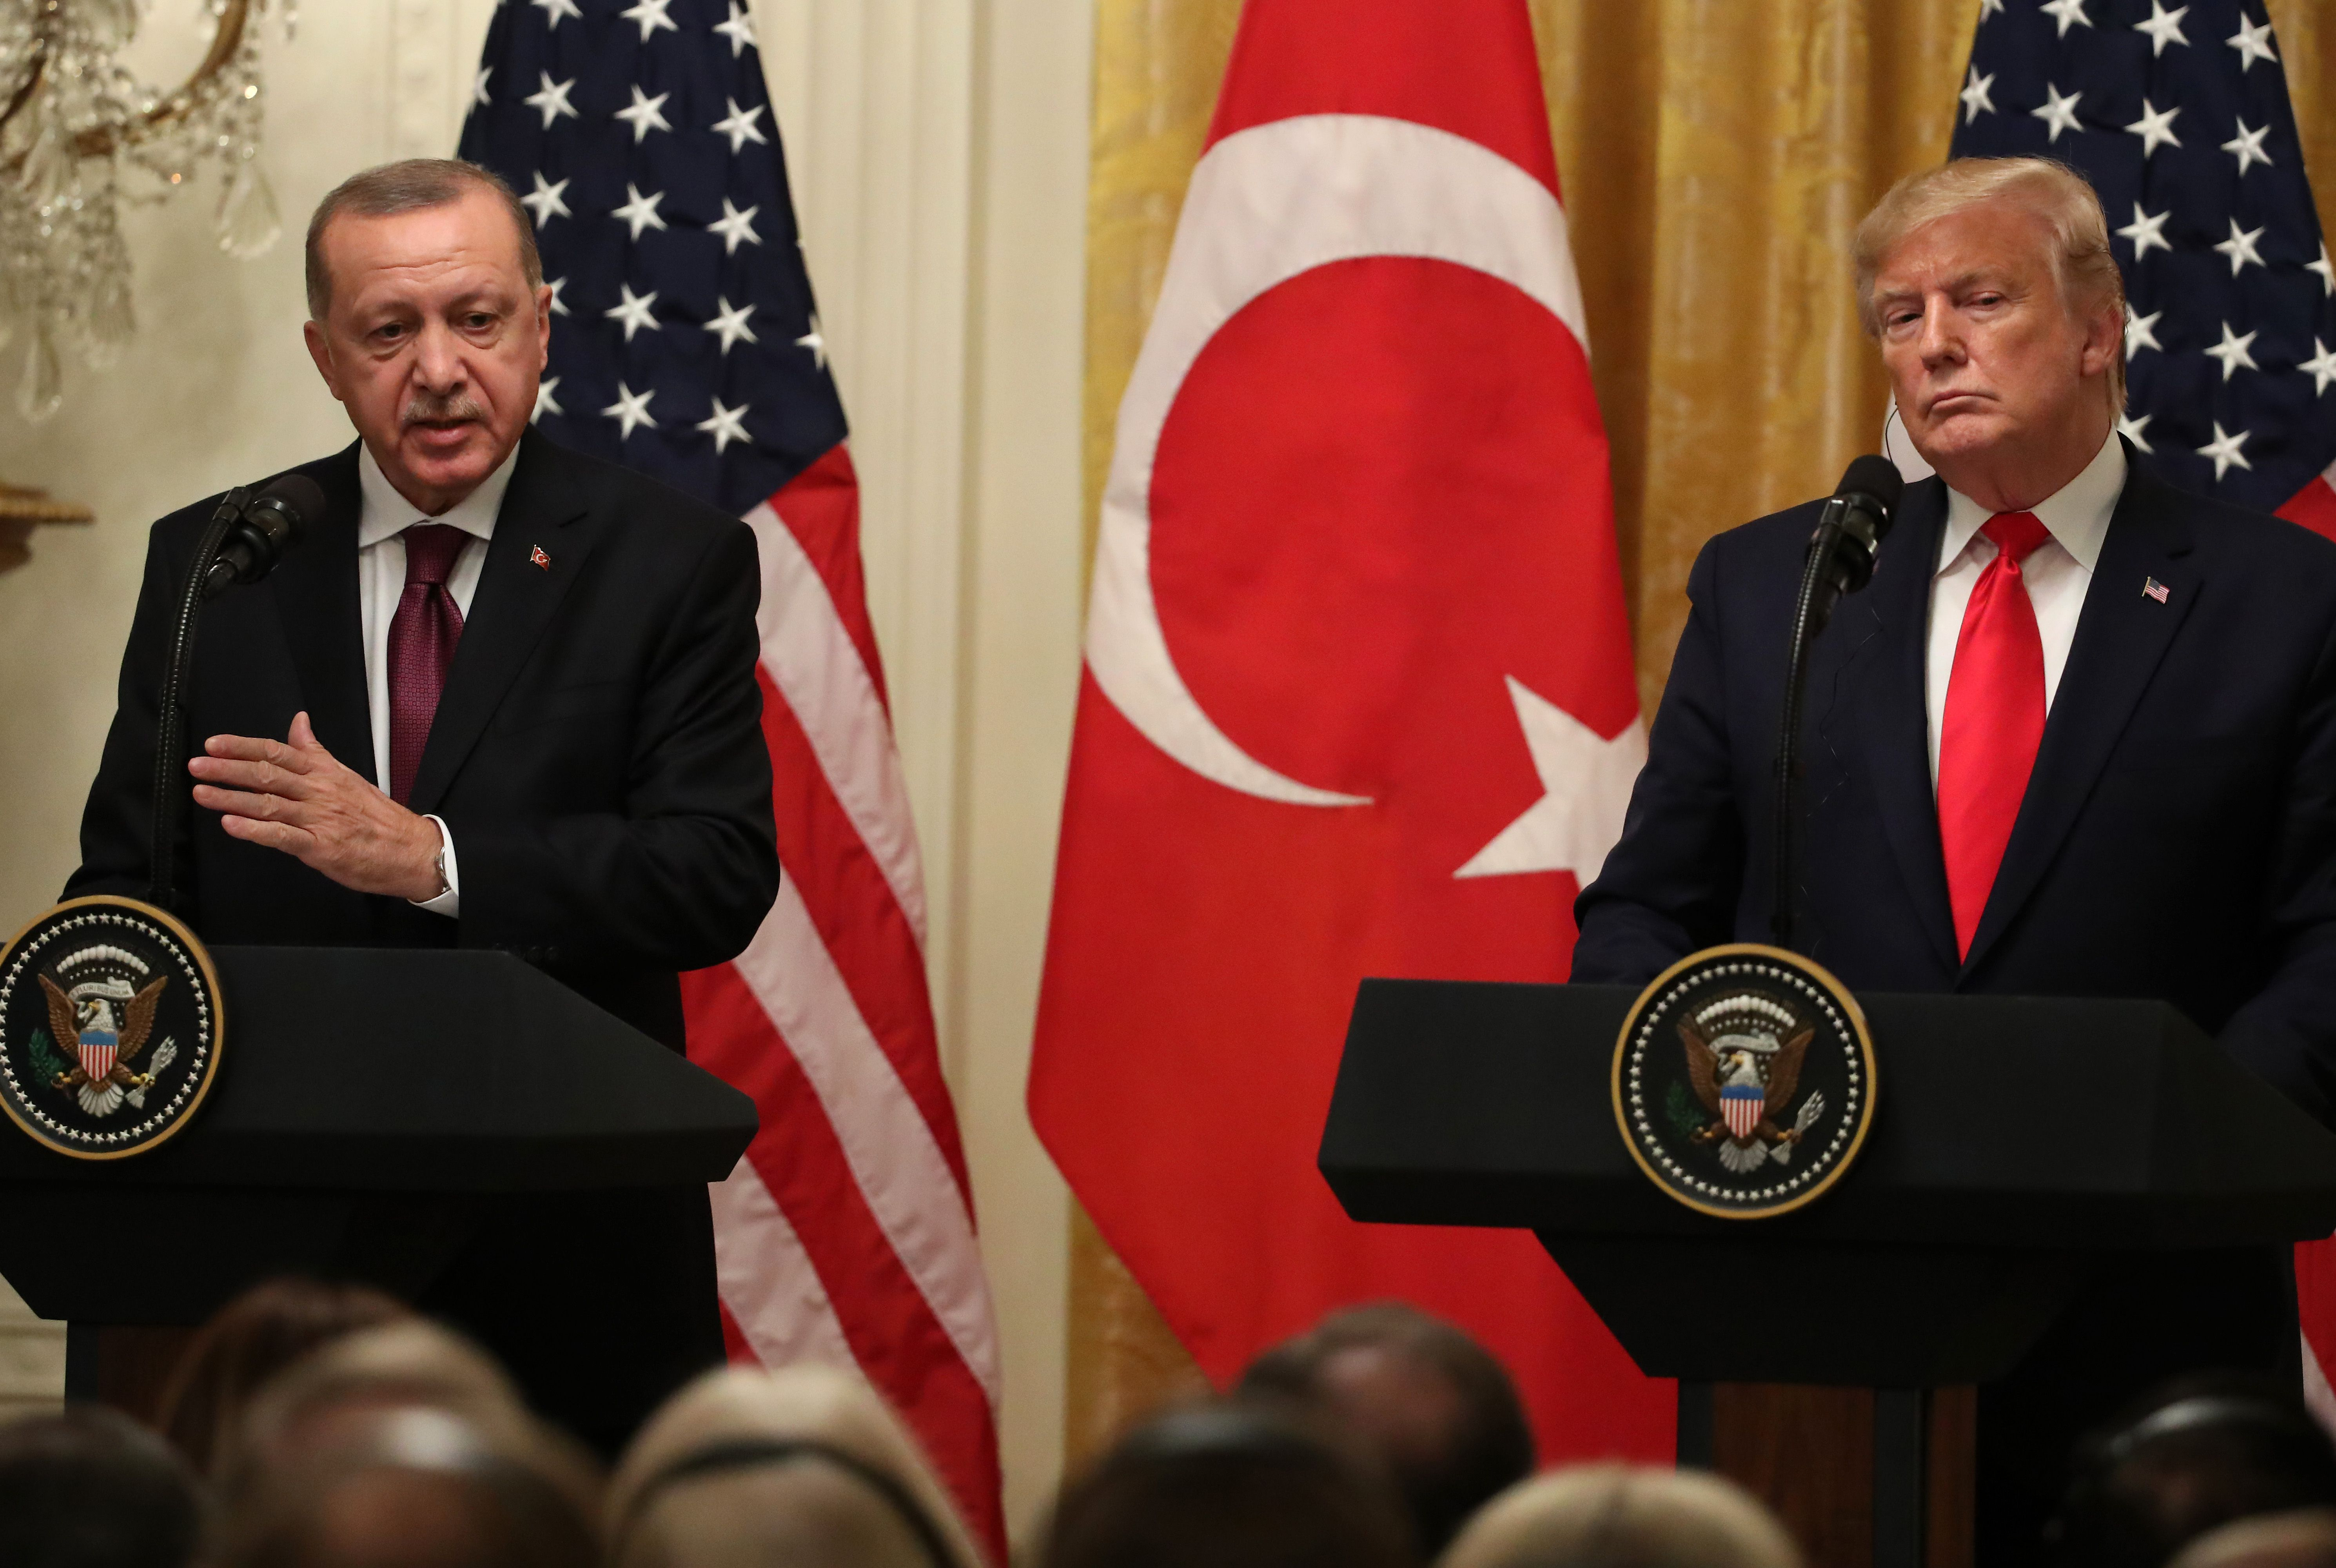 Scoop: Erdogan upends Oval meeting to play anti-Kurd film on iPad - Axios